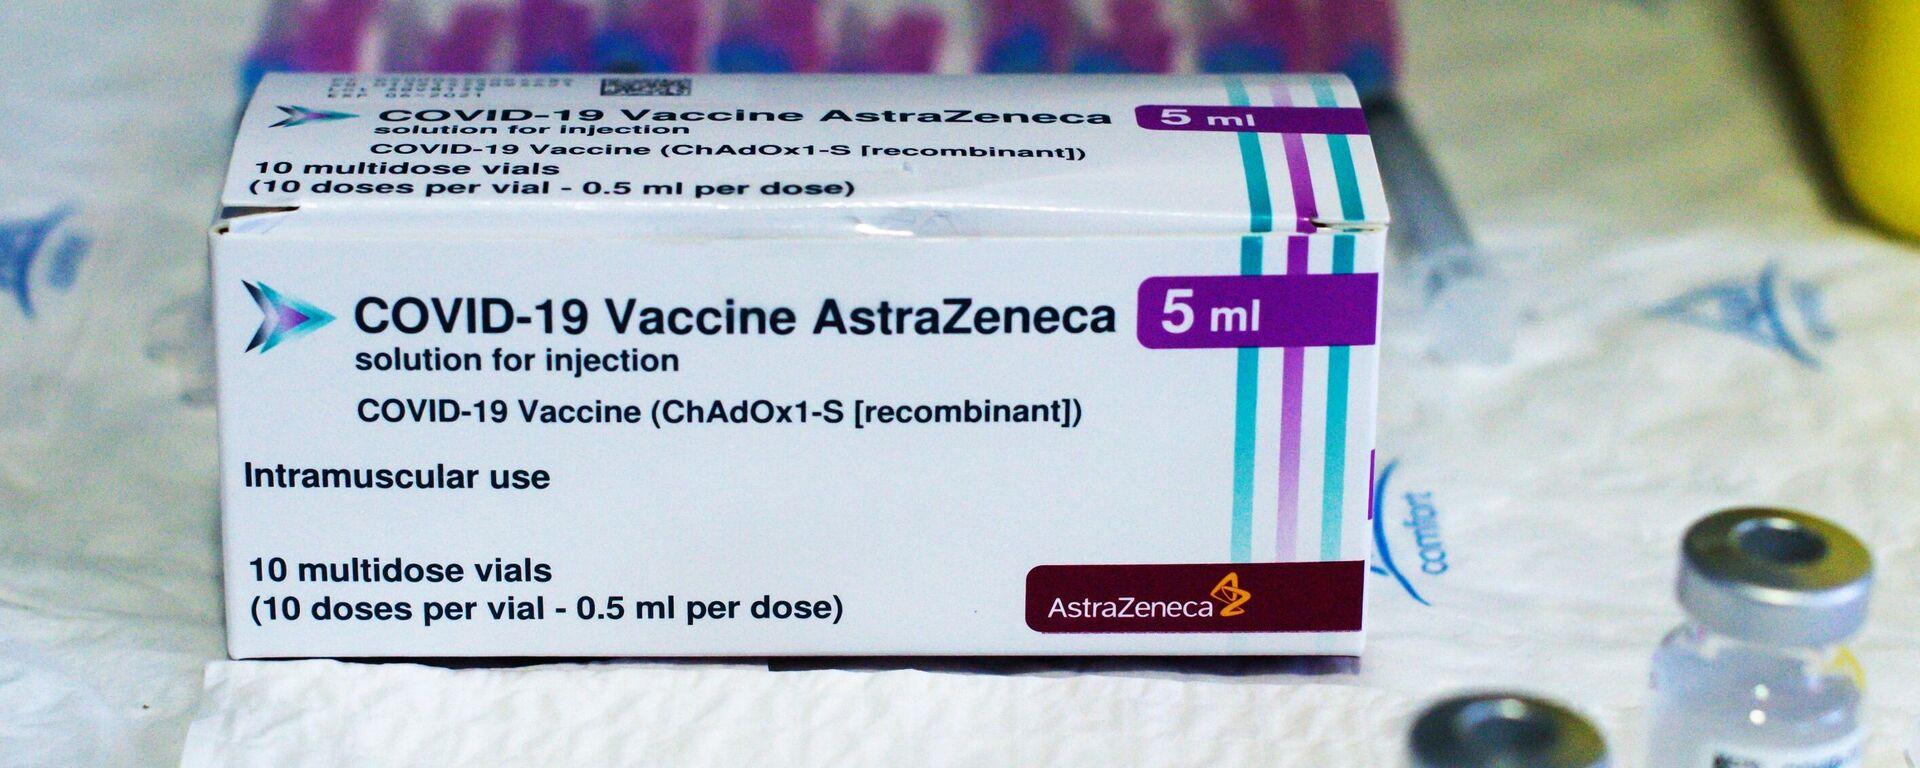 Astrazeneca-Vakzin  - SNA, 1920, 06.07.2021